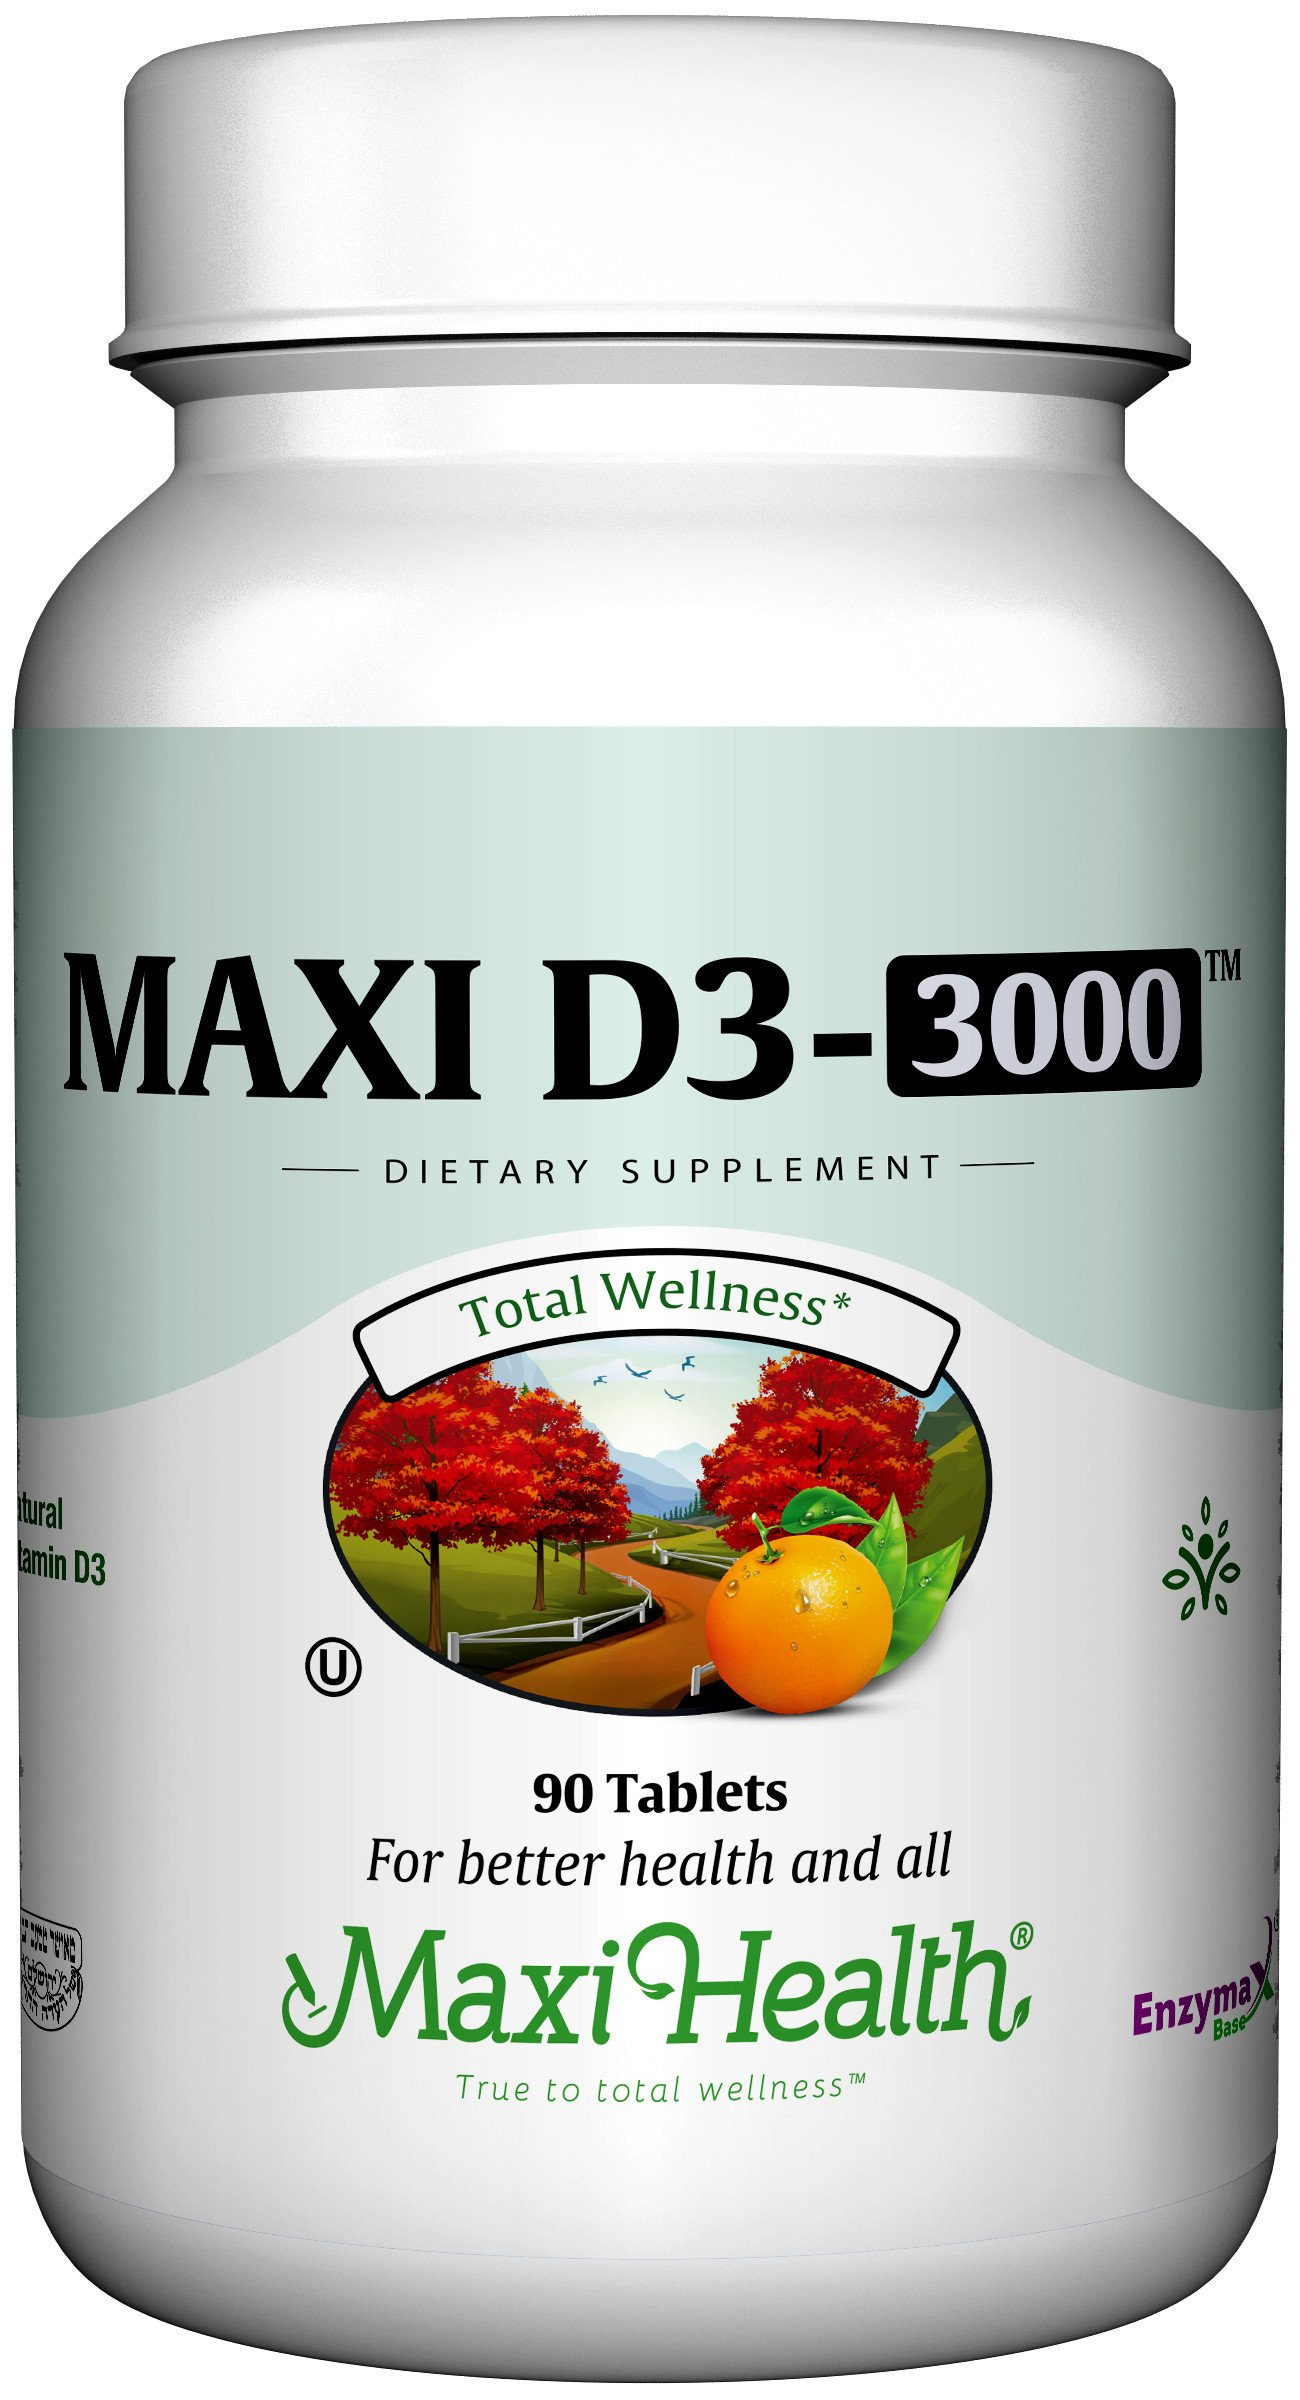 "Maxi Health Natural Vitamin D3 - ""3000 IU"" - Nutrition Supplement - 90 Tablets - Kosher"